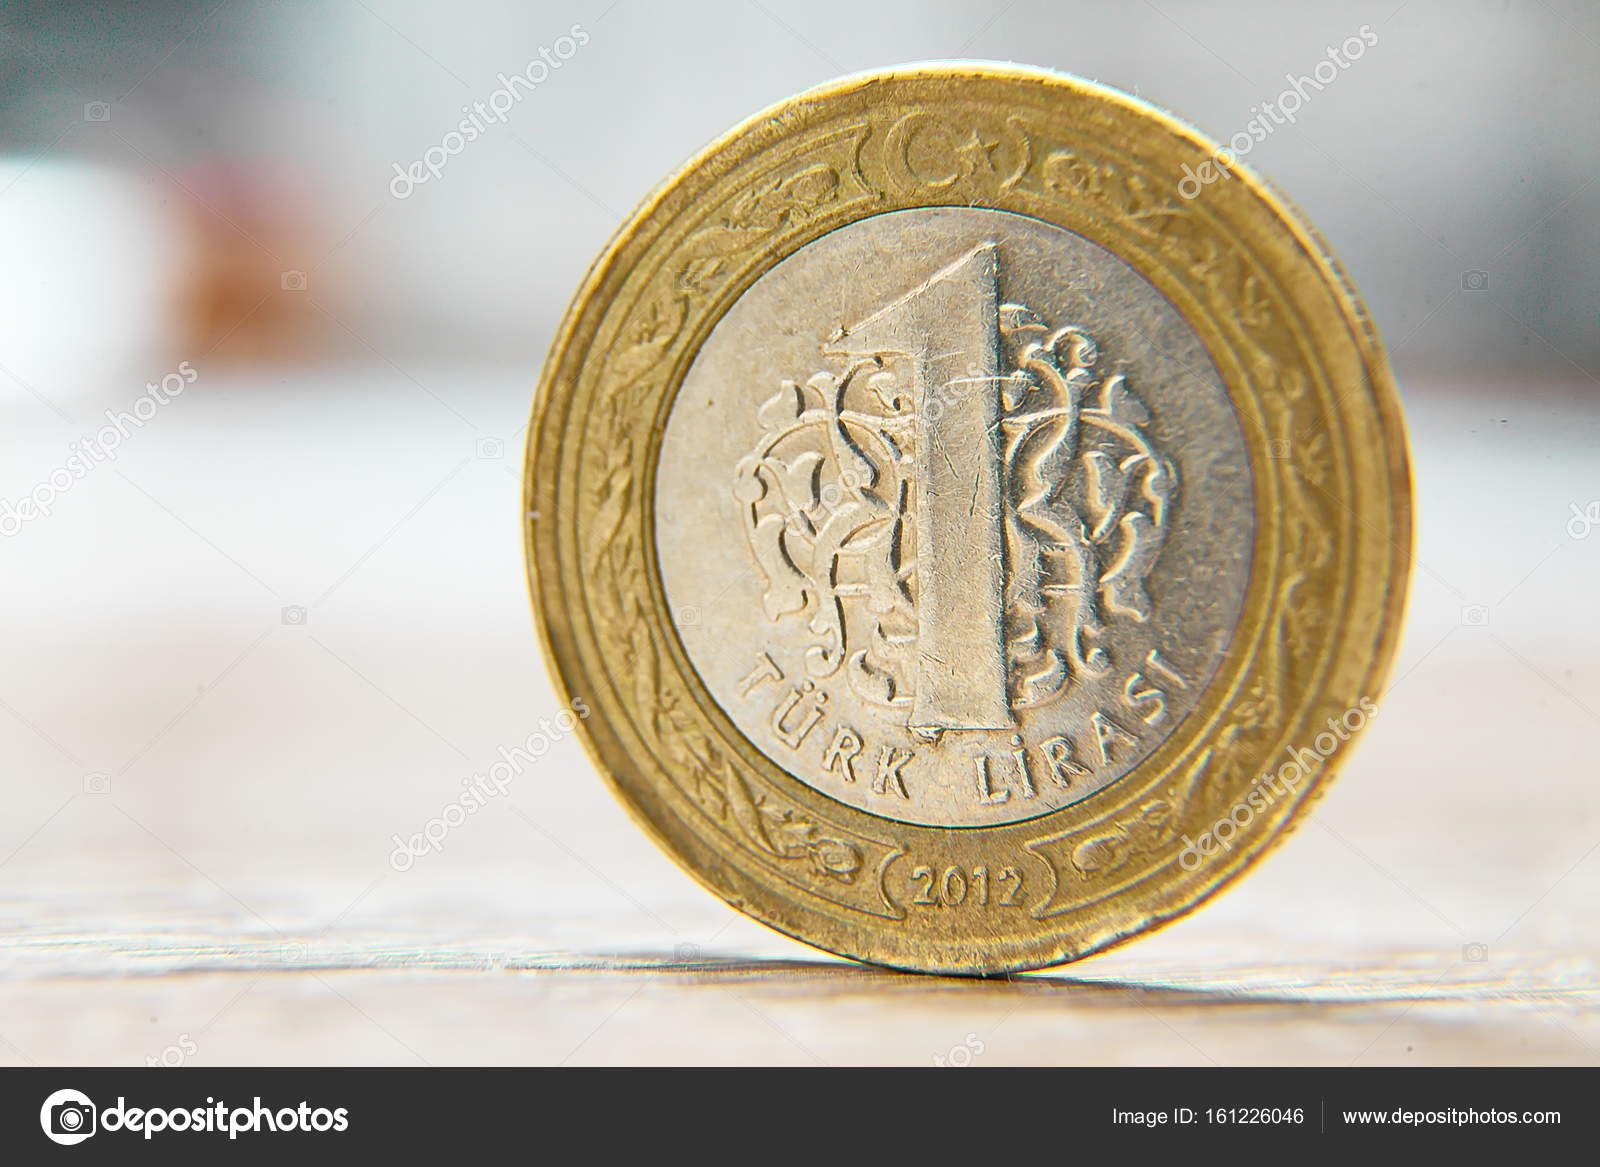 Türkische Lira Münzen Stockfoto Jasastyle 161226046